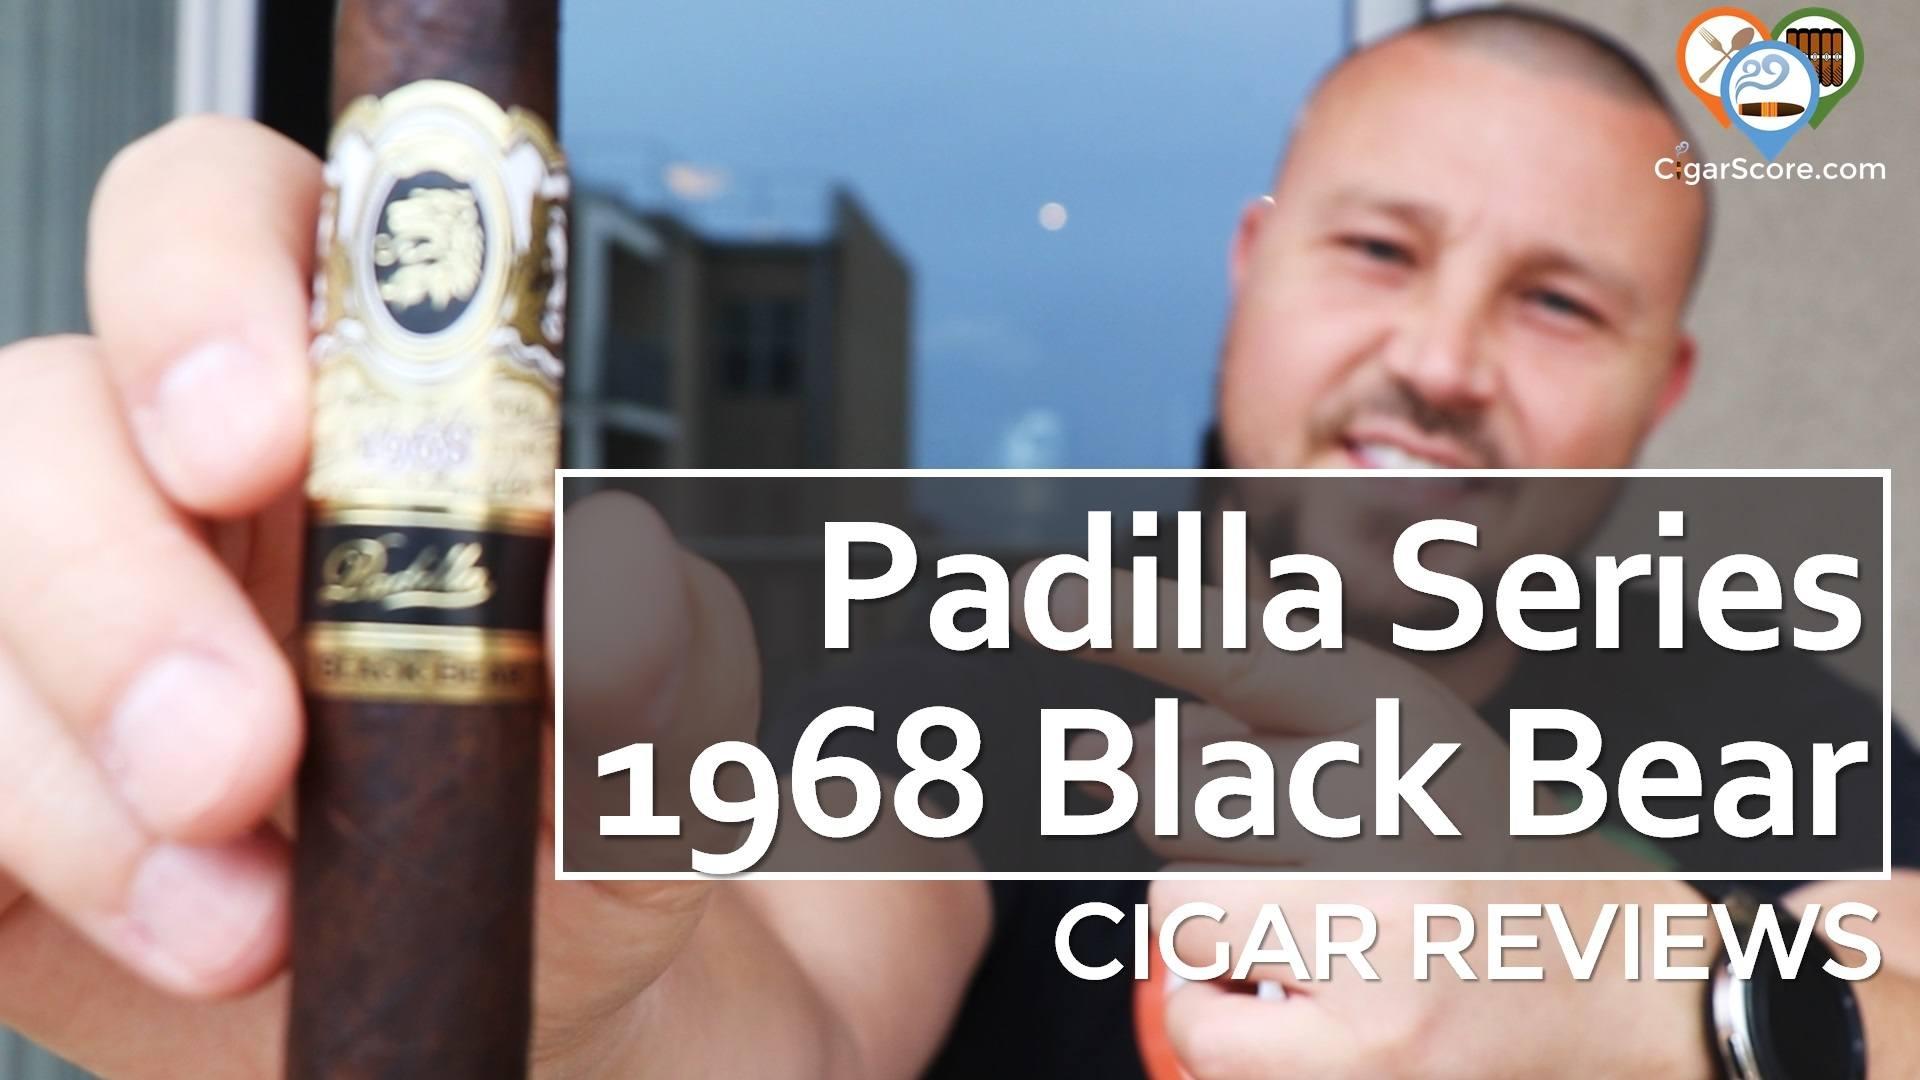 Review - Padilla Series 1968 Black Bear Torpedo